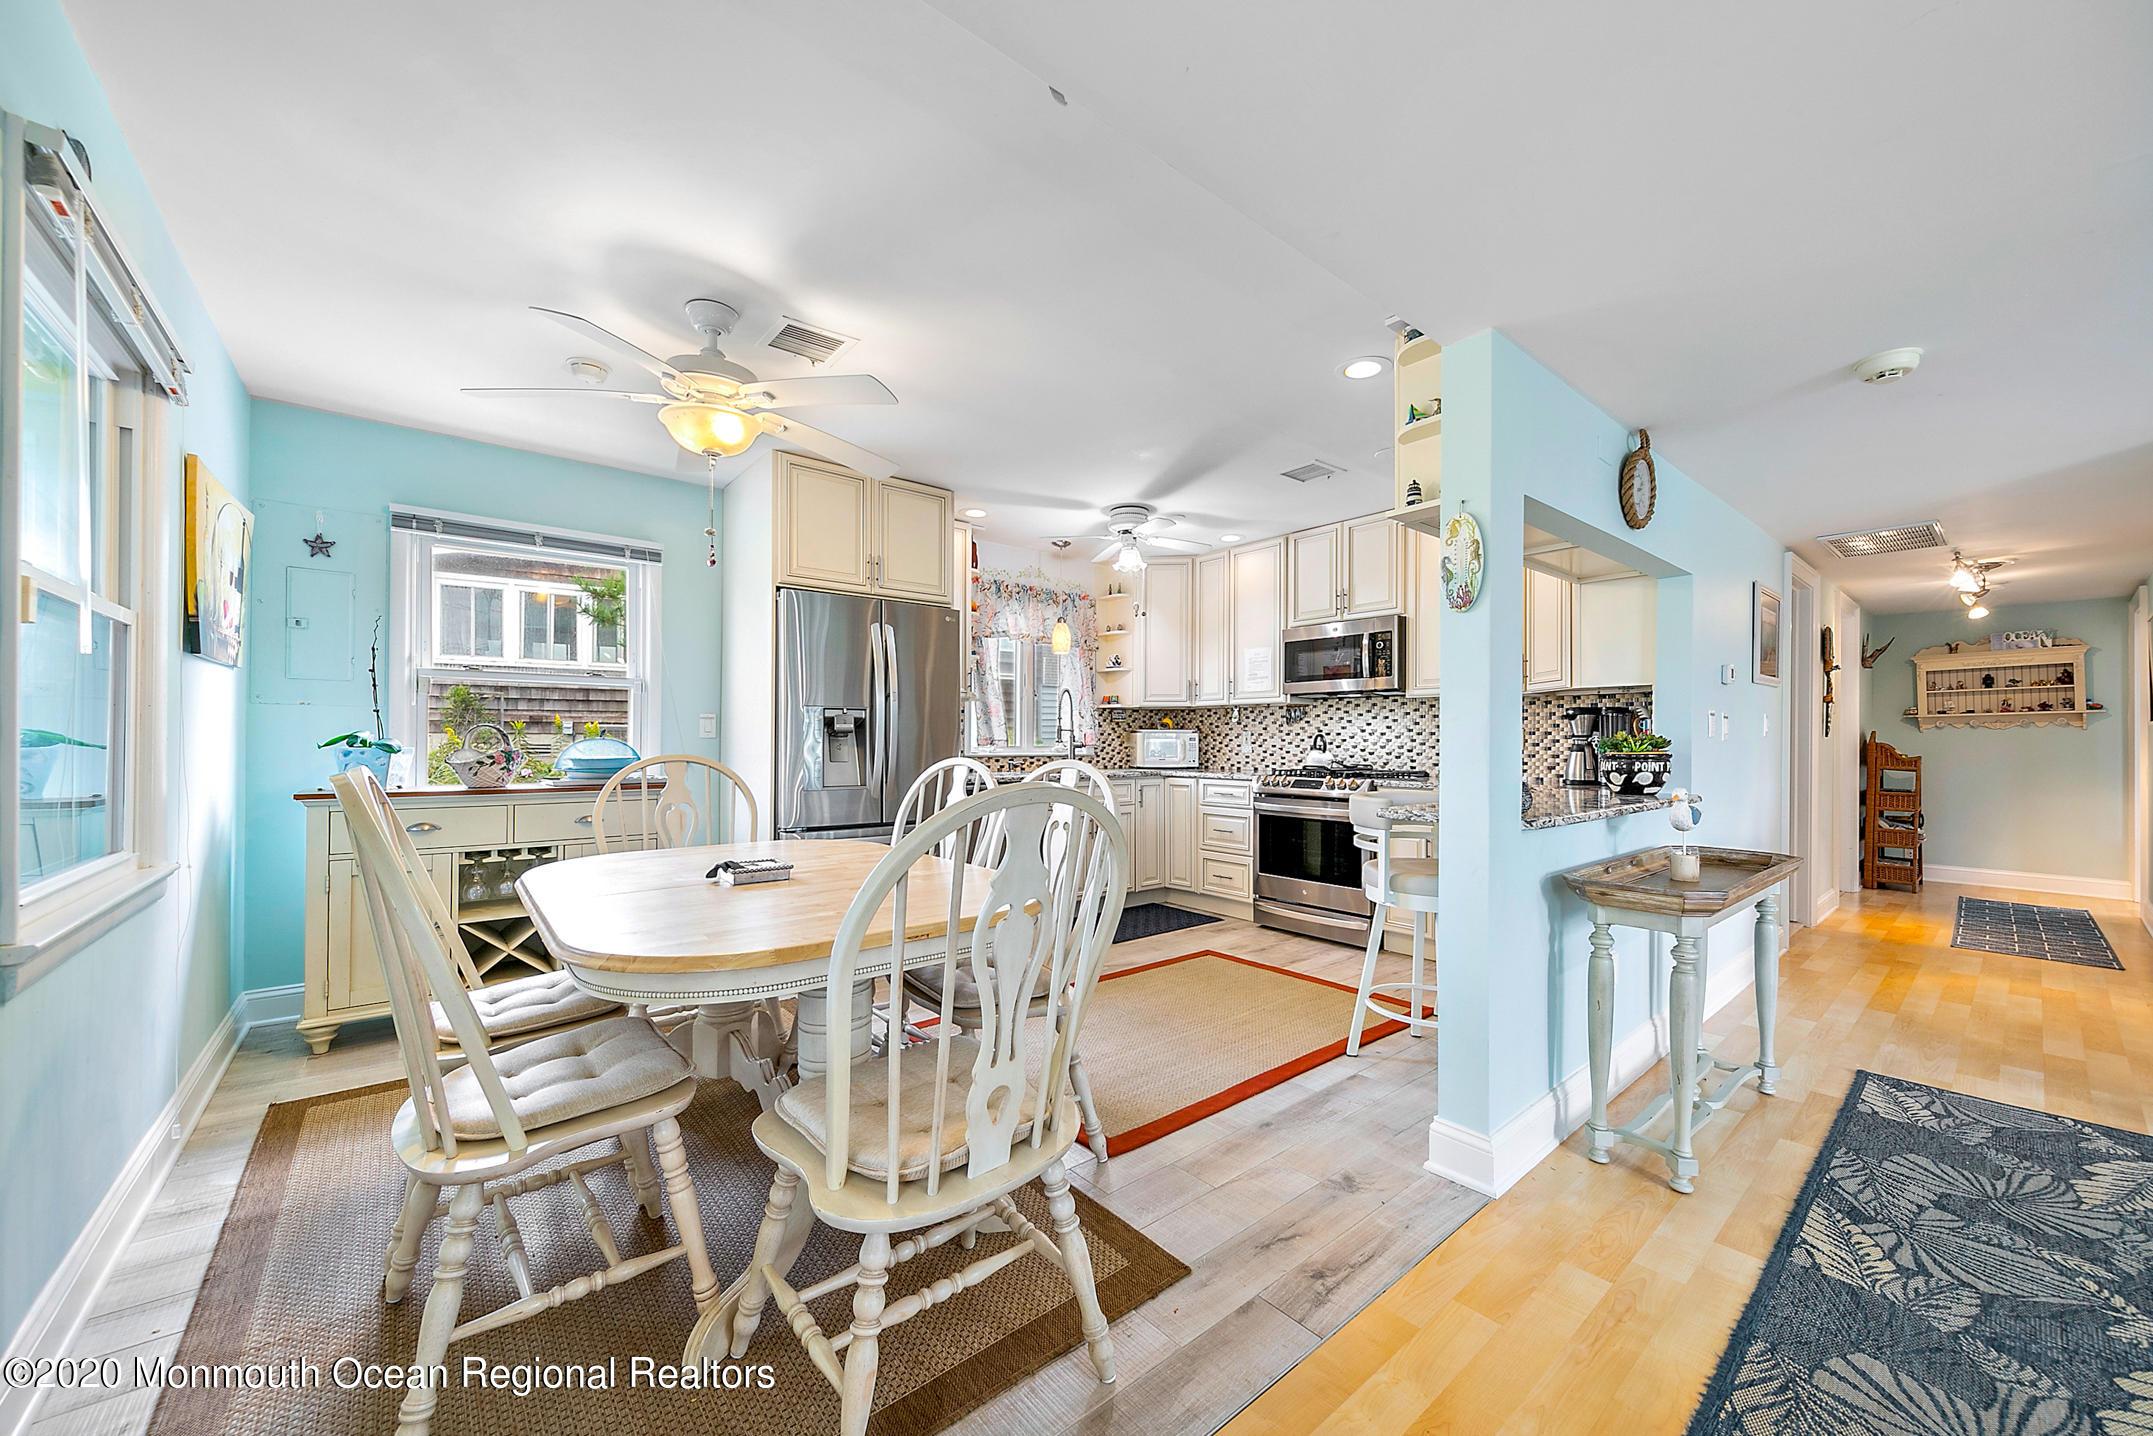 100 Elizabeth Avenue, Point Pleasant Beach, New Jersey 08742, 5 Bedrooms Bedrooms, ,2 BathroomsBathrooms,Single Family,For Sale,100 Elizabeth Avenue,2,22043744